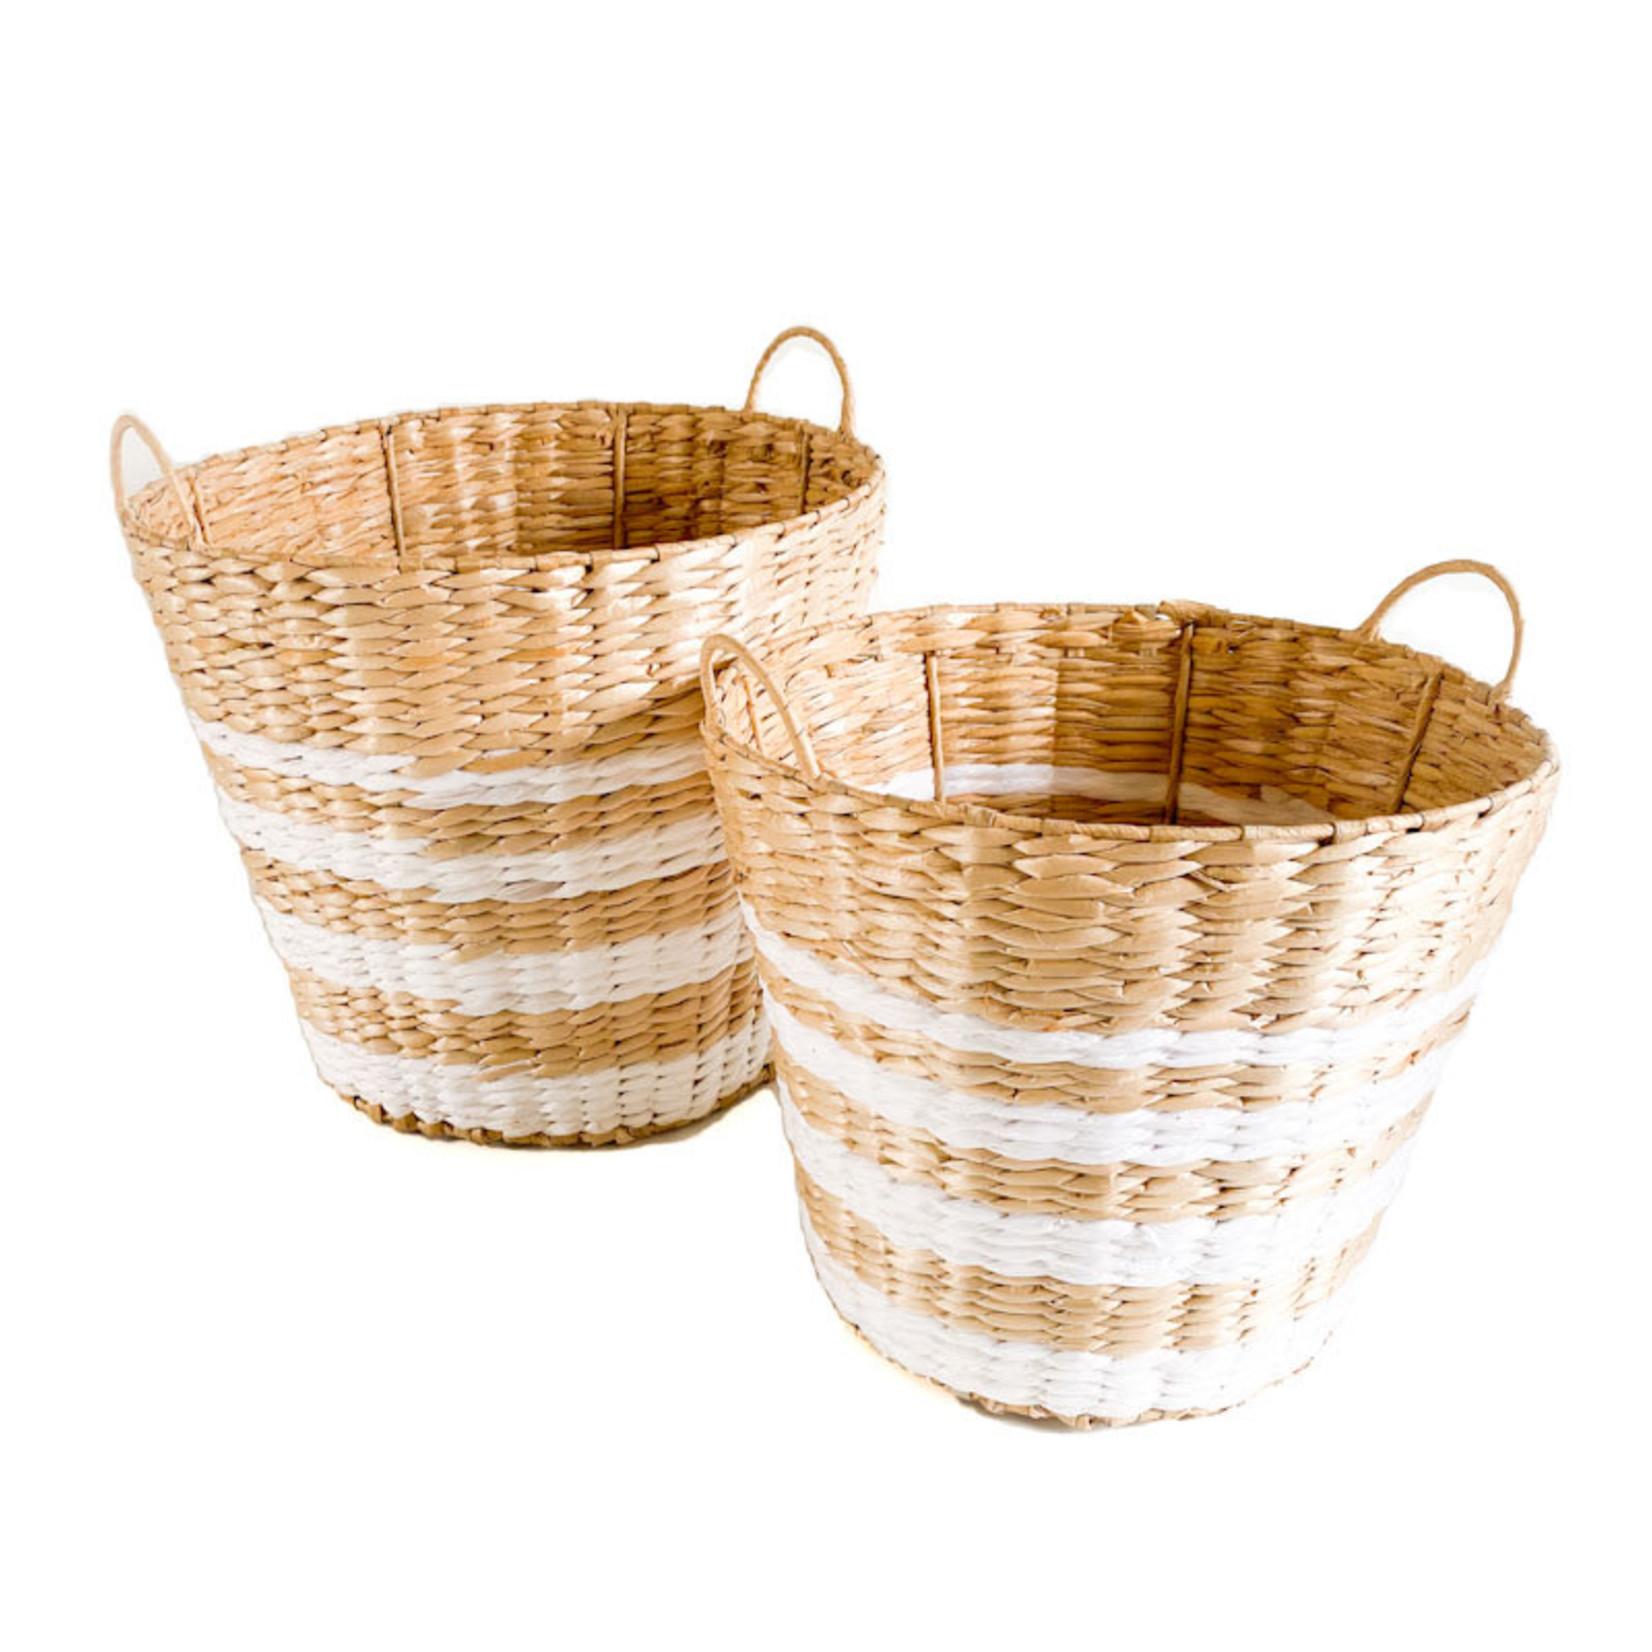 Raffia Basket - Small